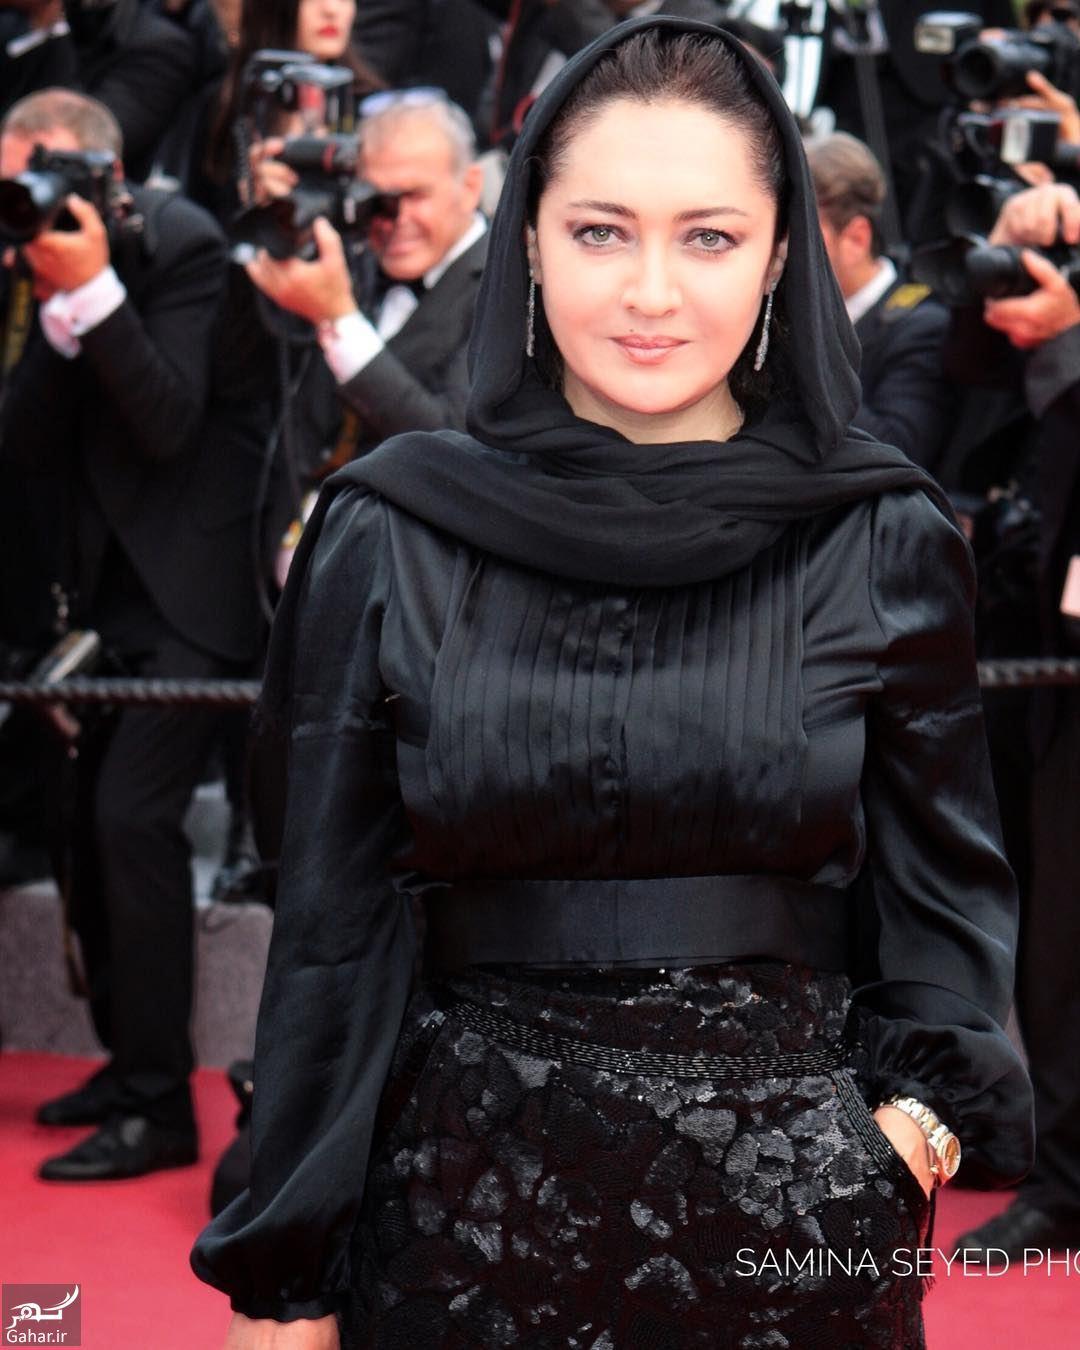 667503 Gahar ir استایل خاص نیکی کریمی در جشنواره کن 2018 / تصاویر